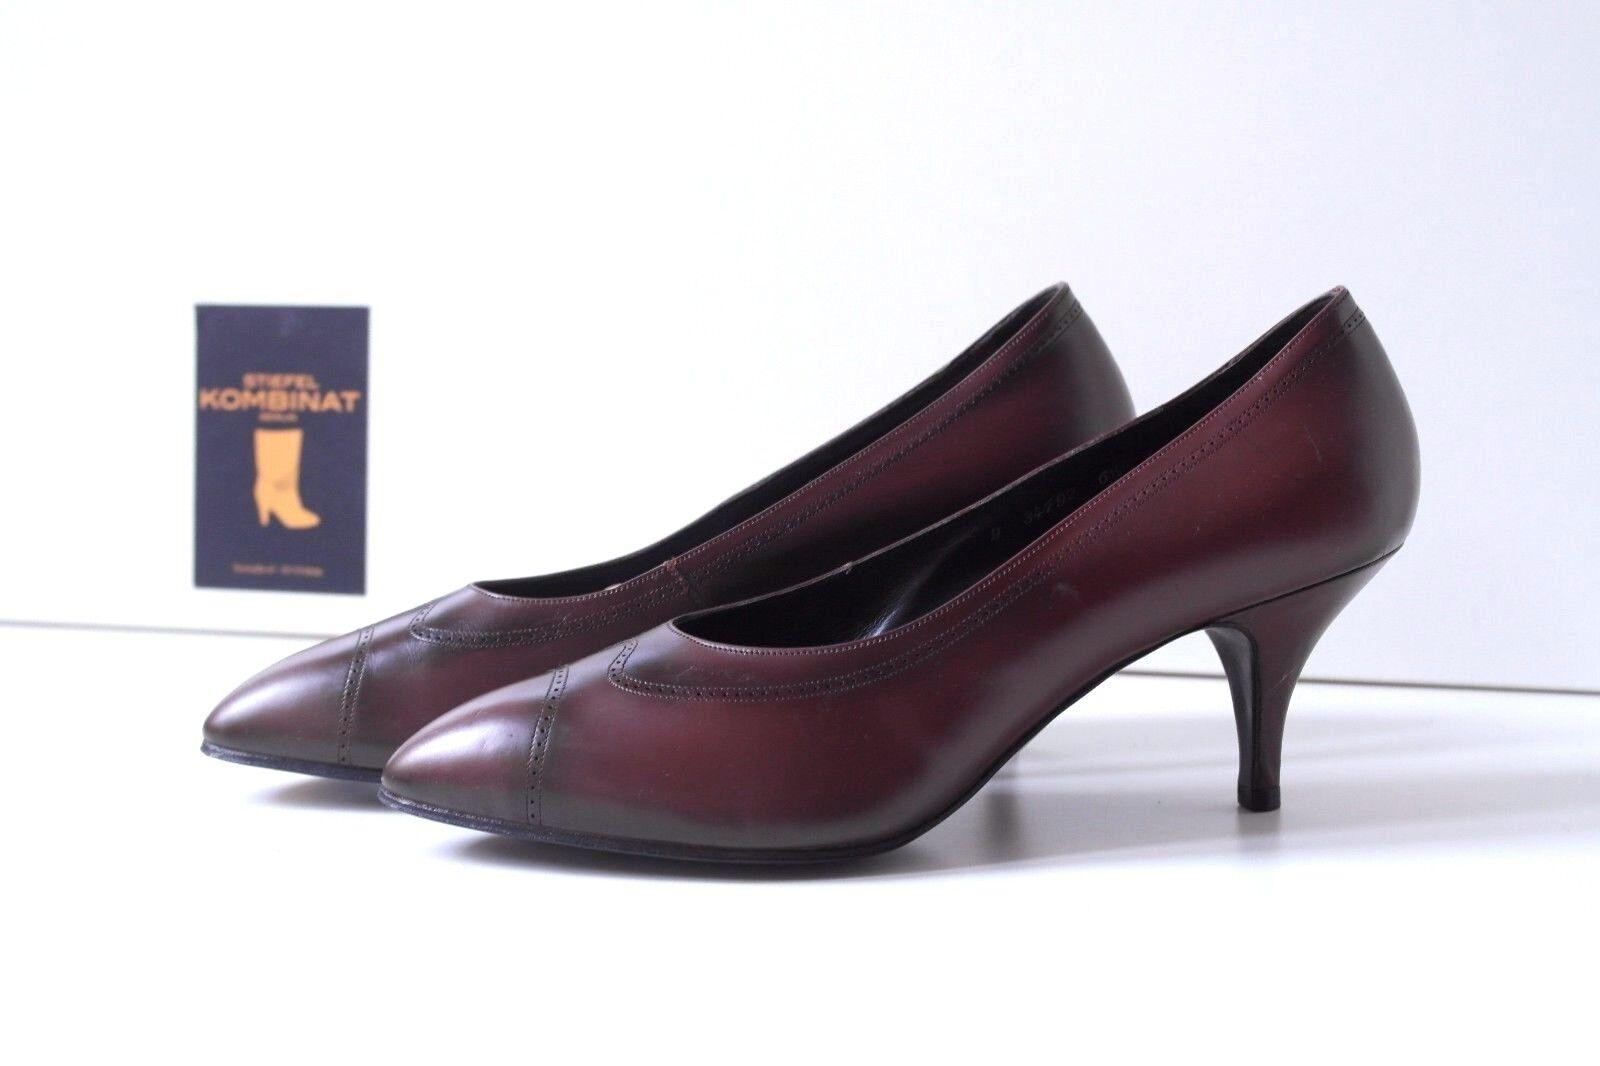 TRUE VINTAGE Damen Latina antik Pumps Rheinberger Madame Latina Damen NOS Schuhe Halbschuhe 3baf52